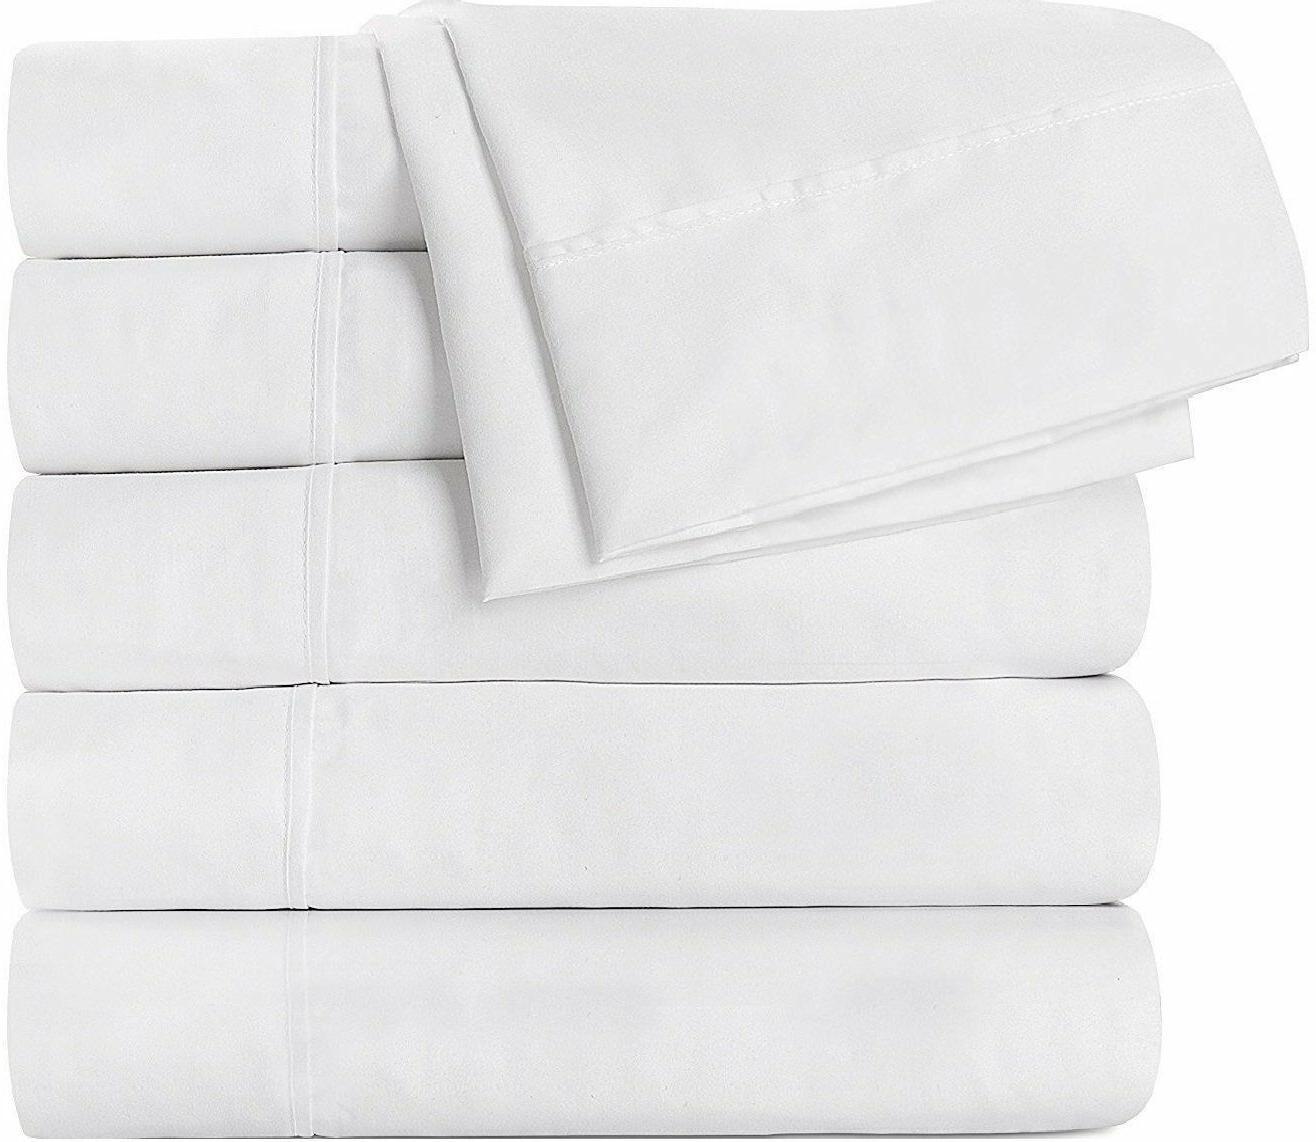 Flat Sheet Brushed Microfiber Soft Breathable Pack of 6 Utop